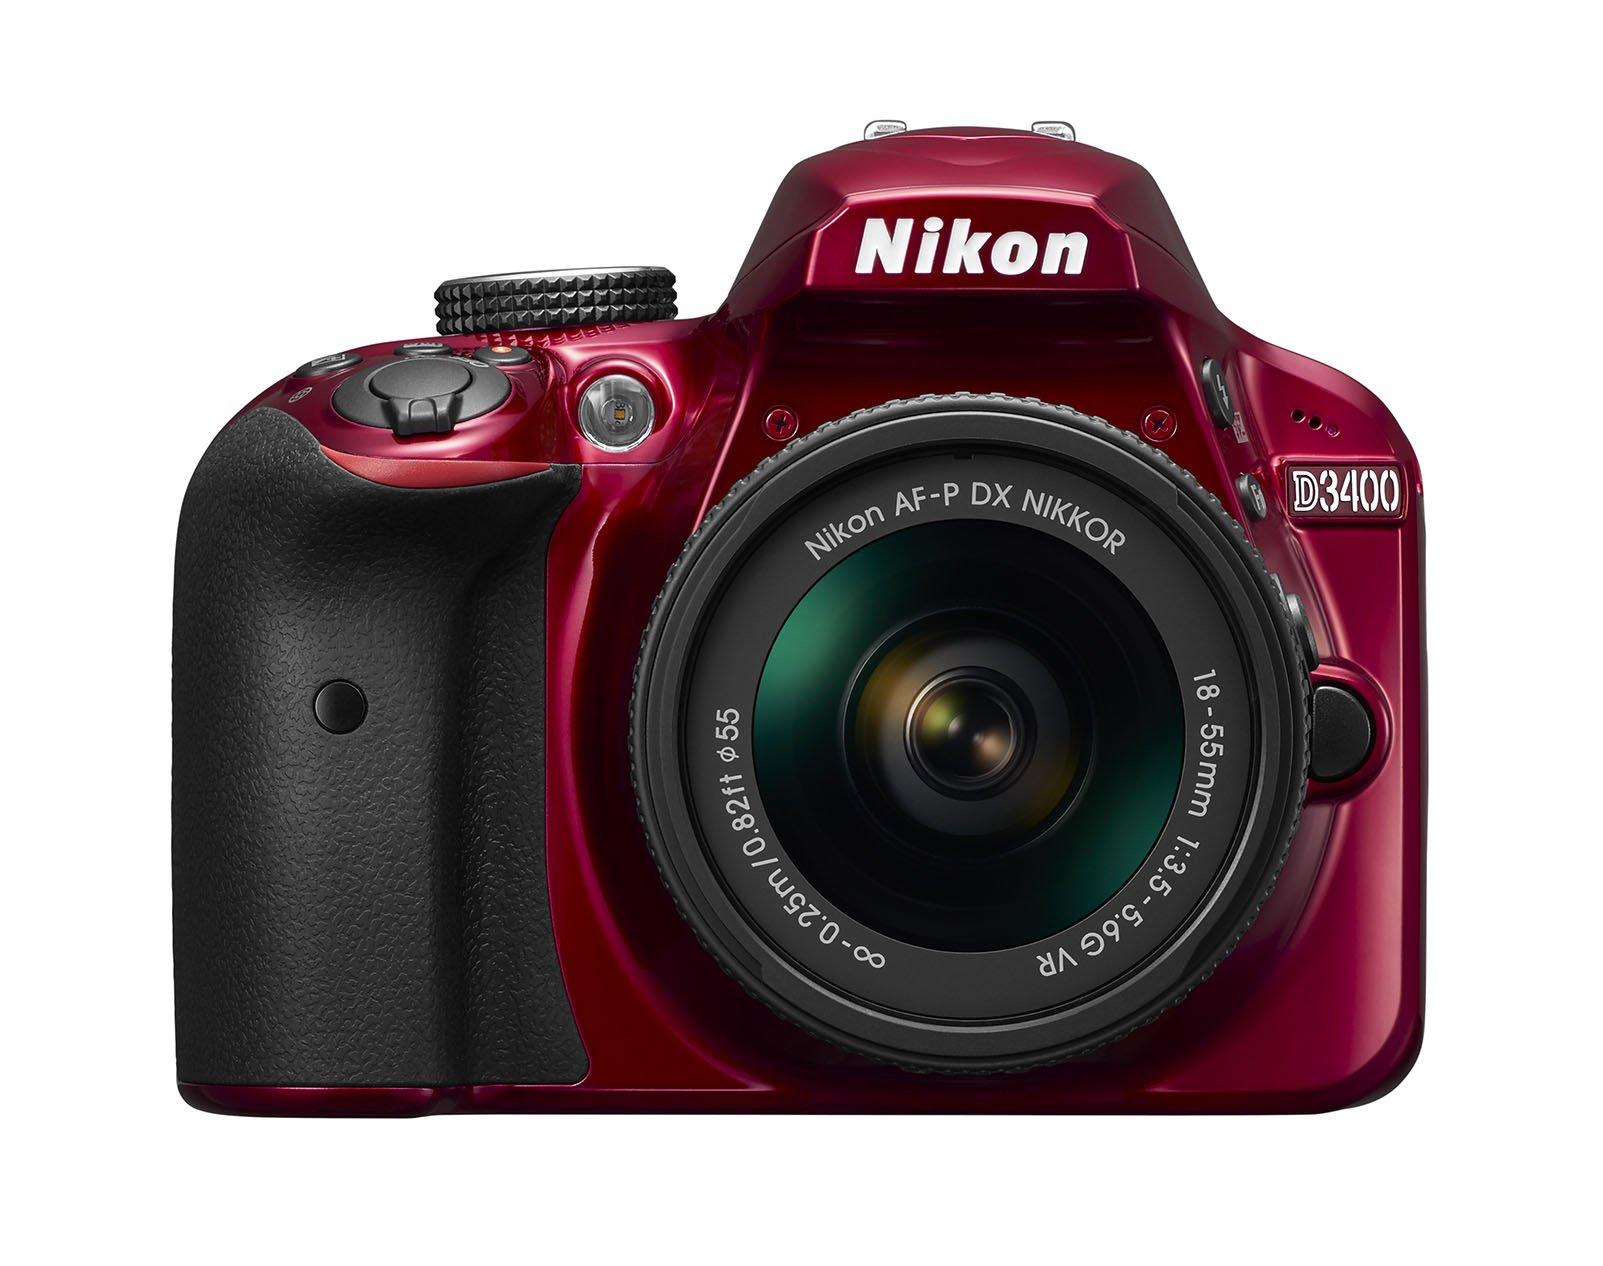 Nikon D3400 w/ AF-P DX NIKKOR 18-55mm f/3.5-5.6G VR (Red) by Nikon